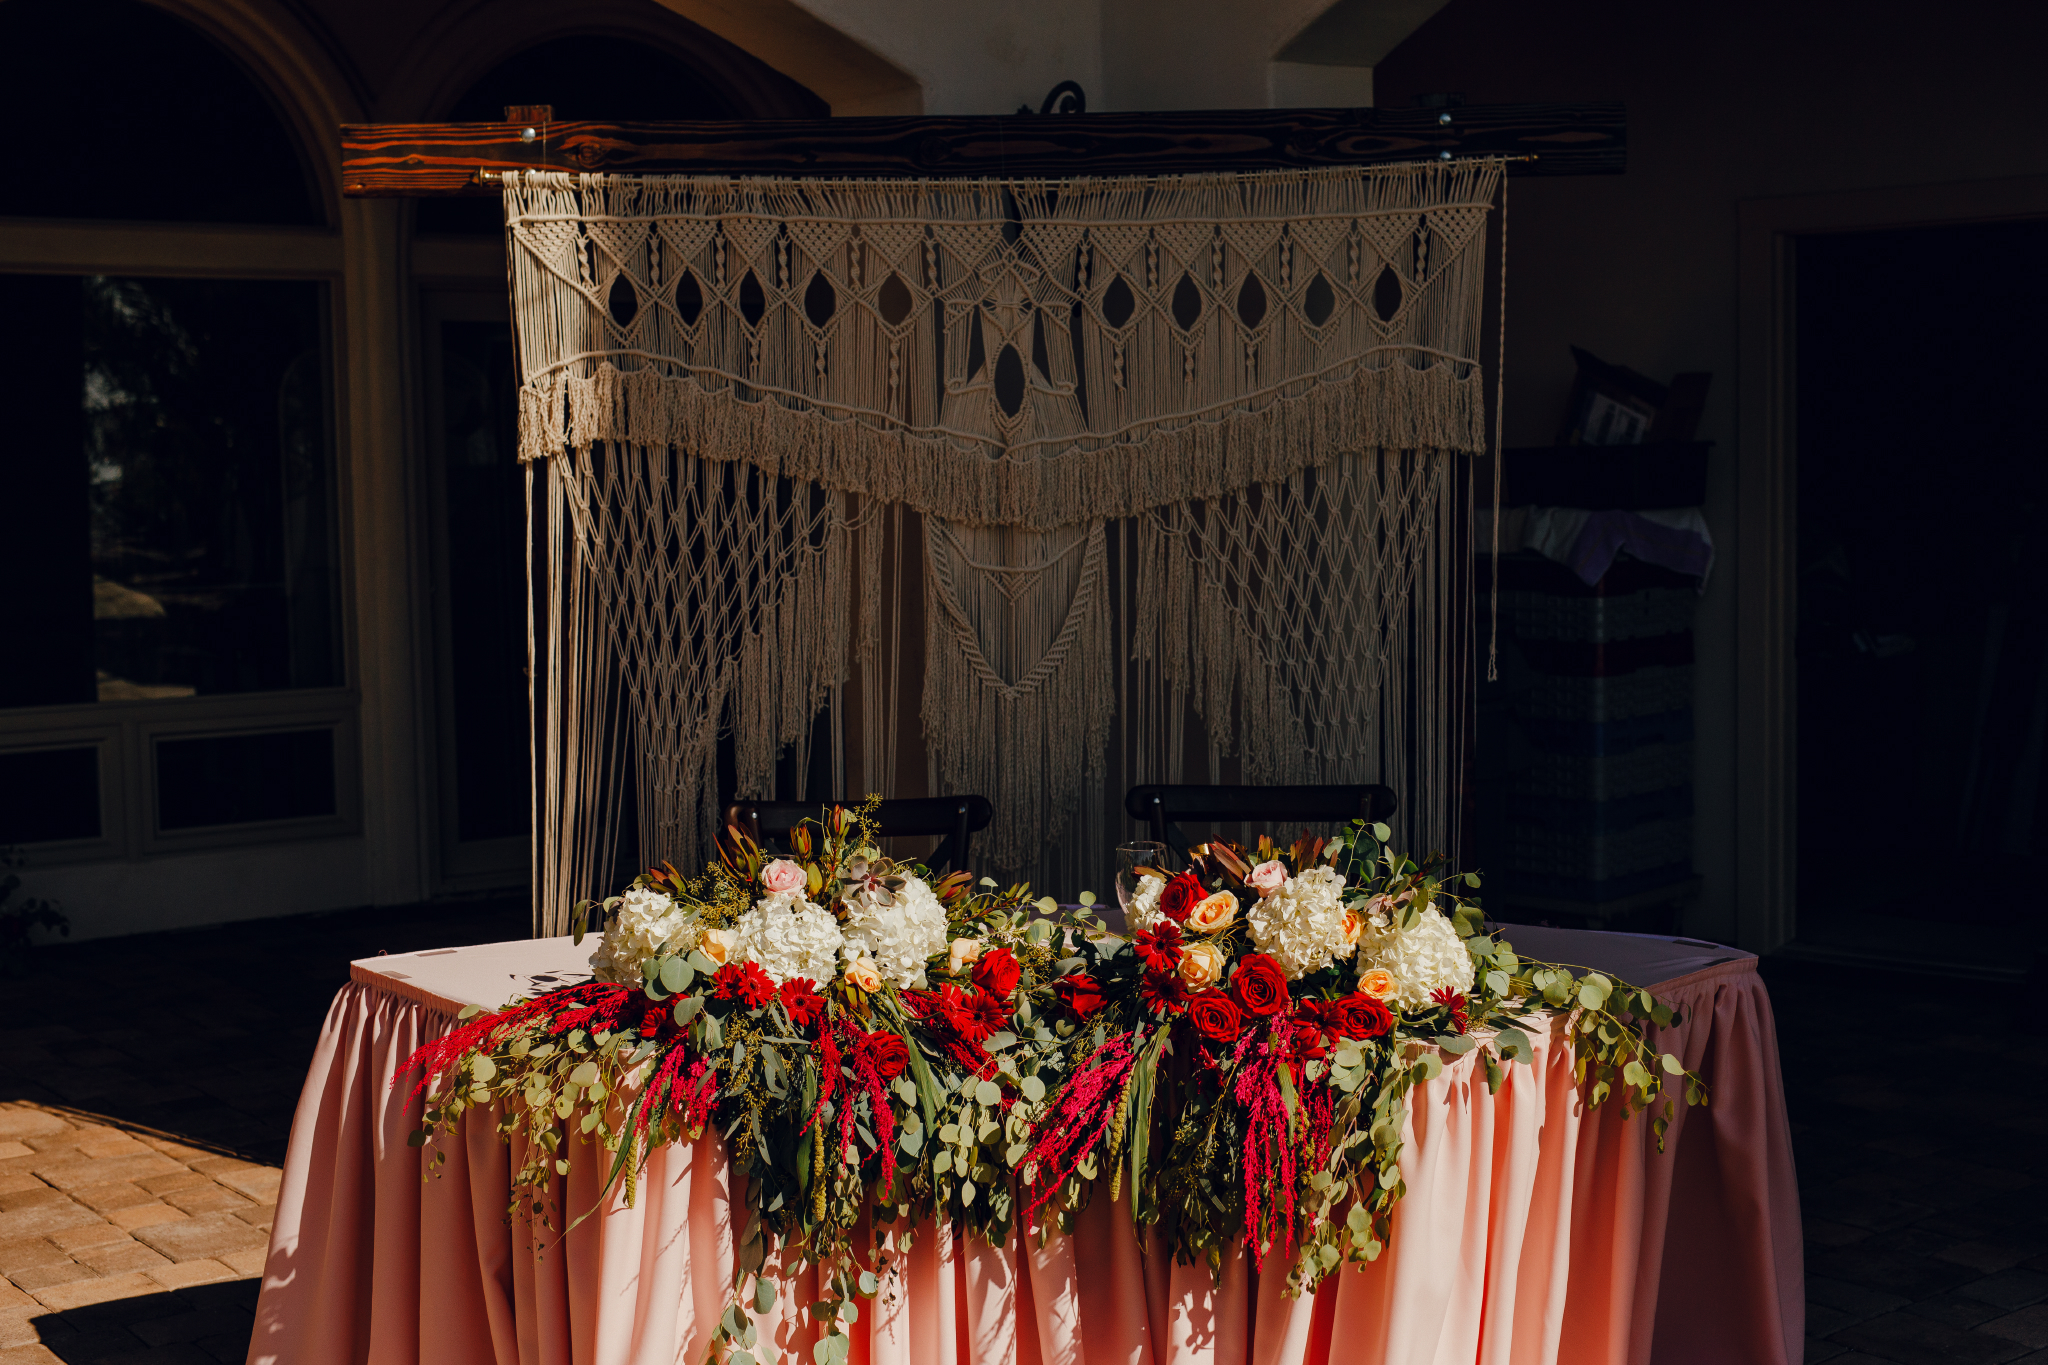 San Diego Wedding Photographer | sweethearts table at a Montana Cielo wedding